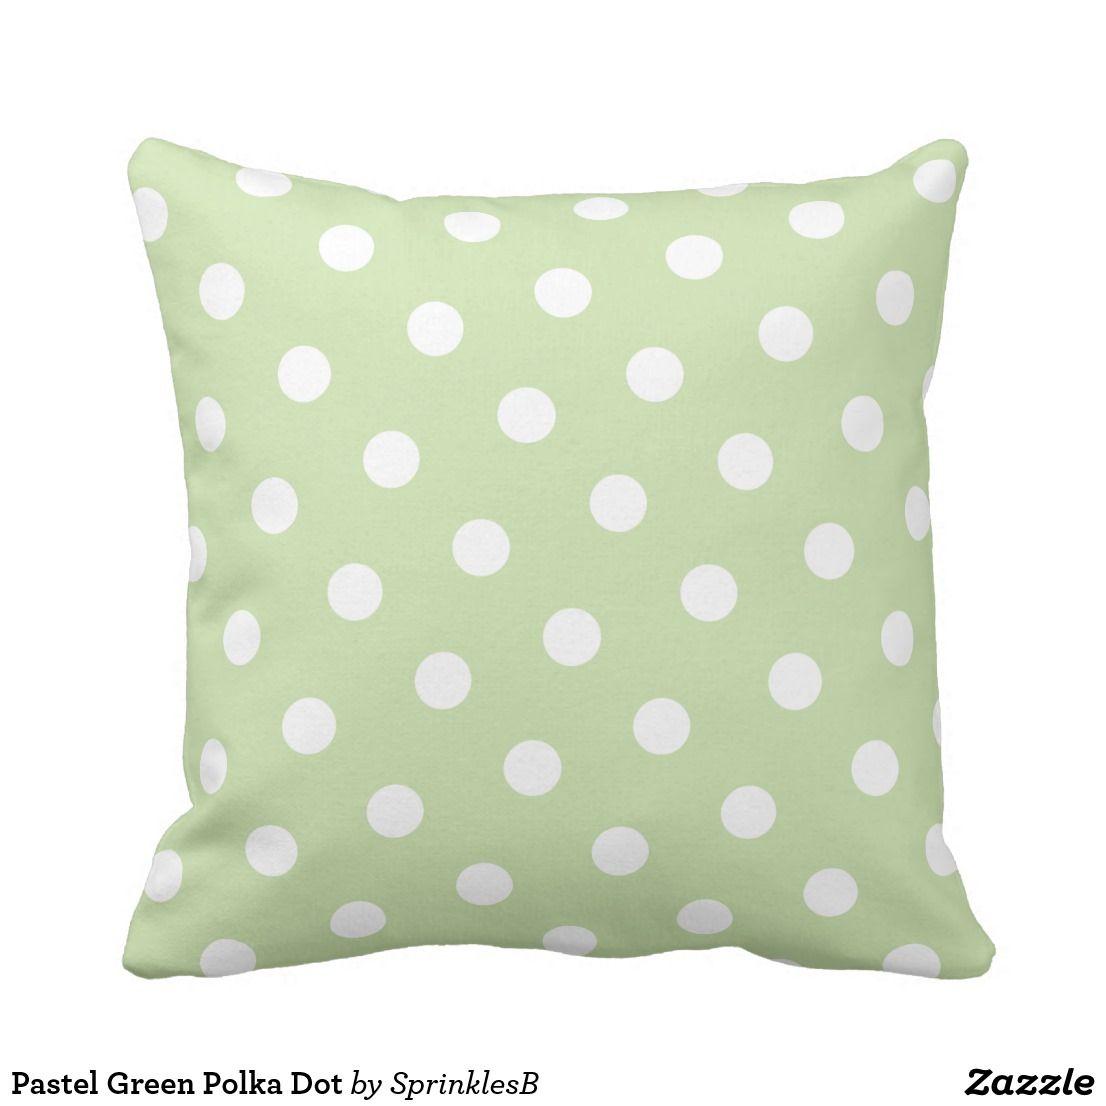 Miraculous Pastel Green Polka Dot Throw Pillow Zazzle Com Nice Machost Co Dining Chair Design Ideas Machostcouk